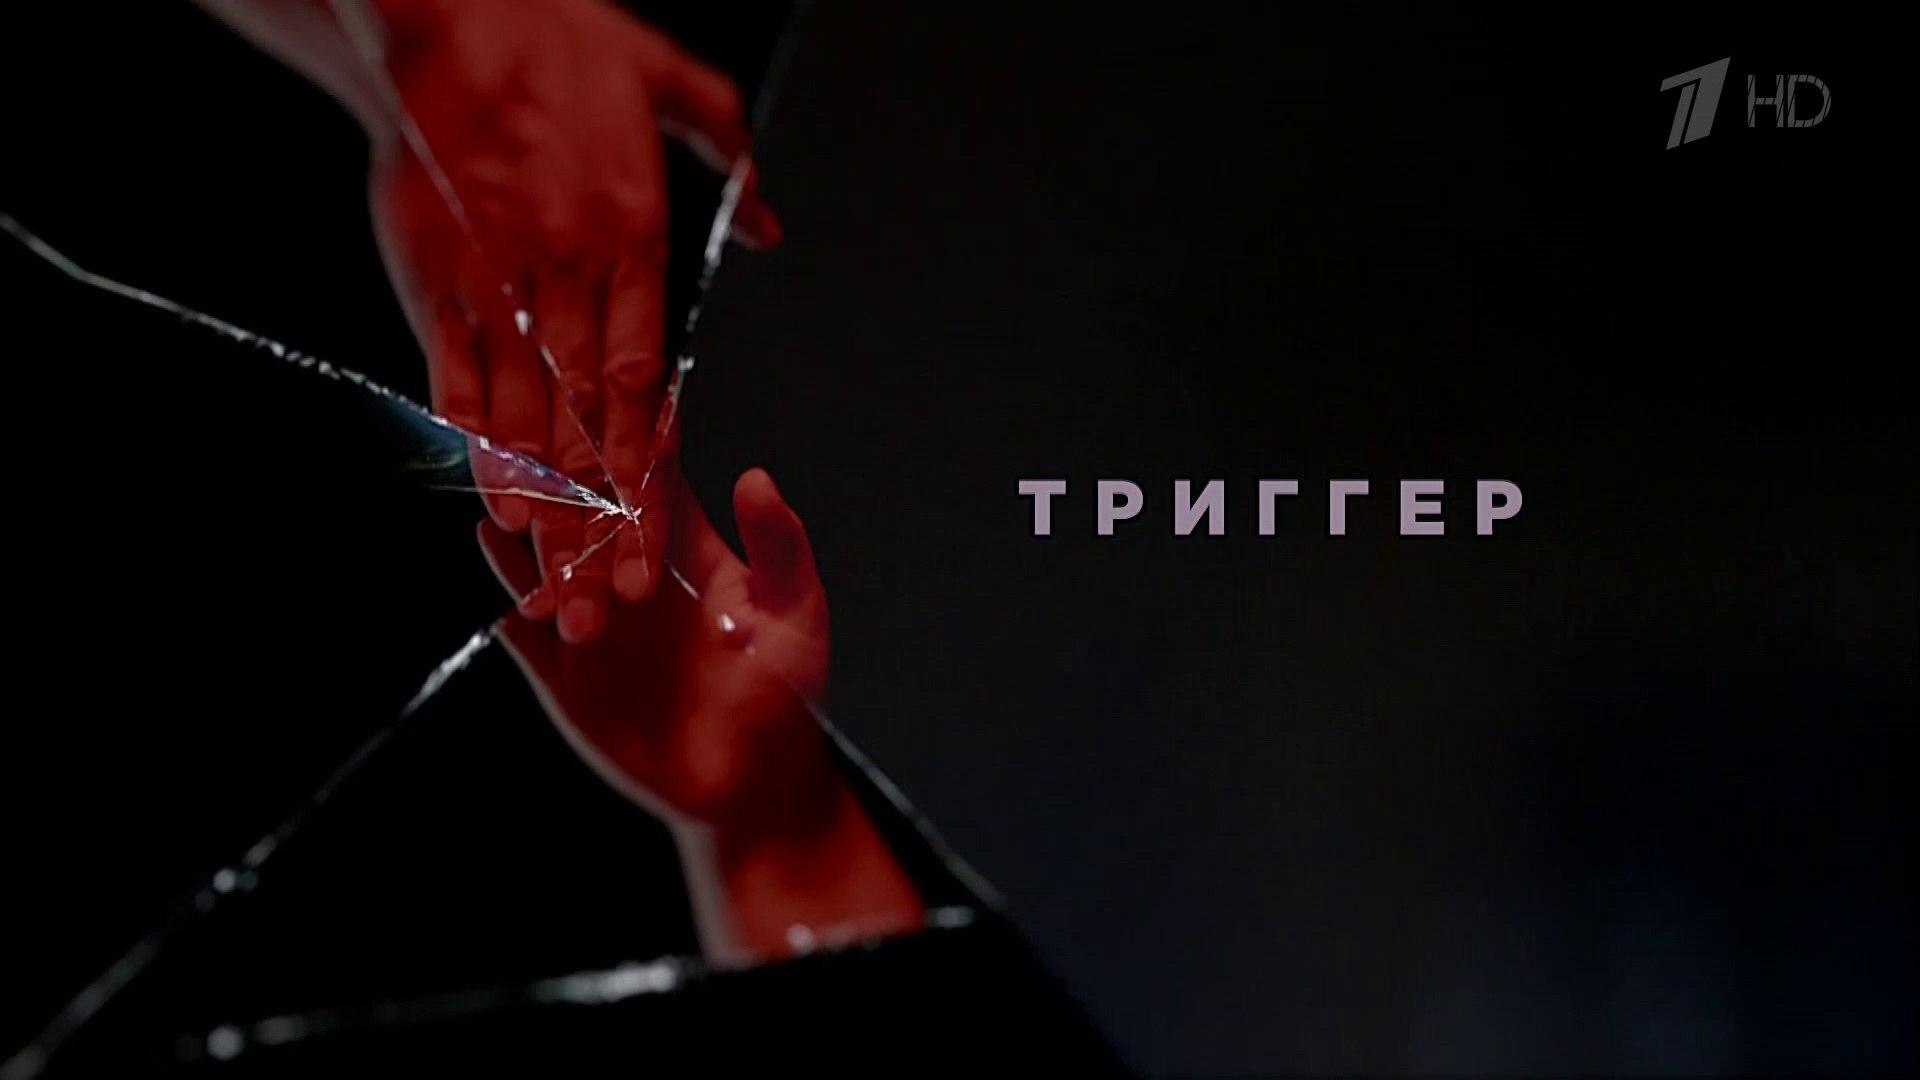 Триггер - 8 серия (2020) HD смотреть онлайн